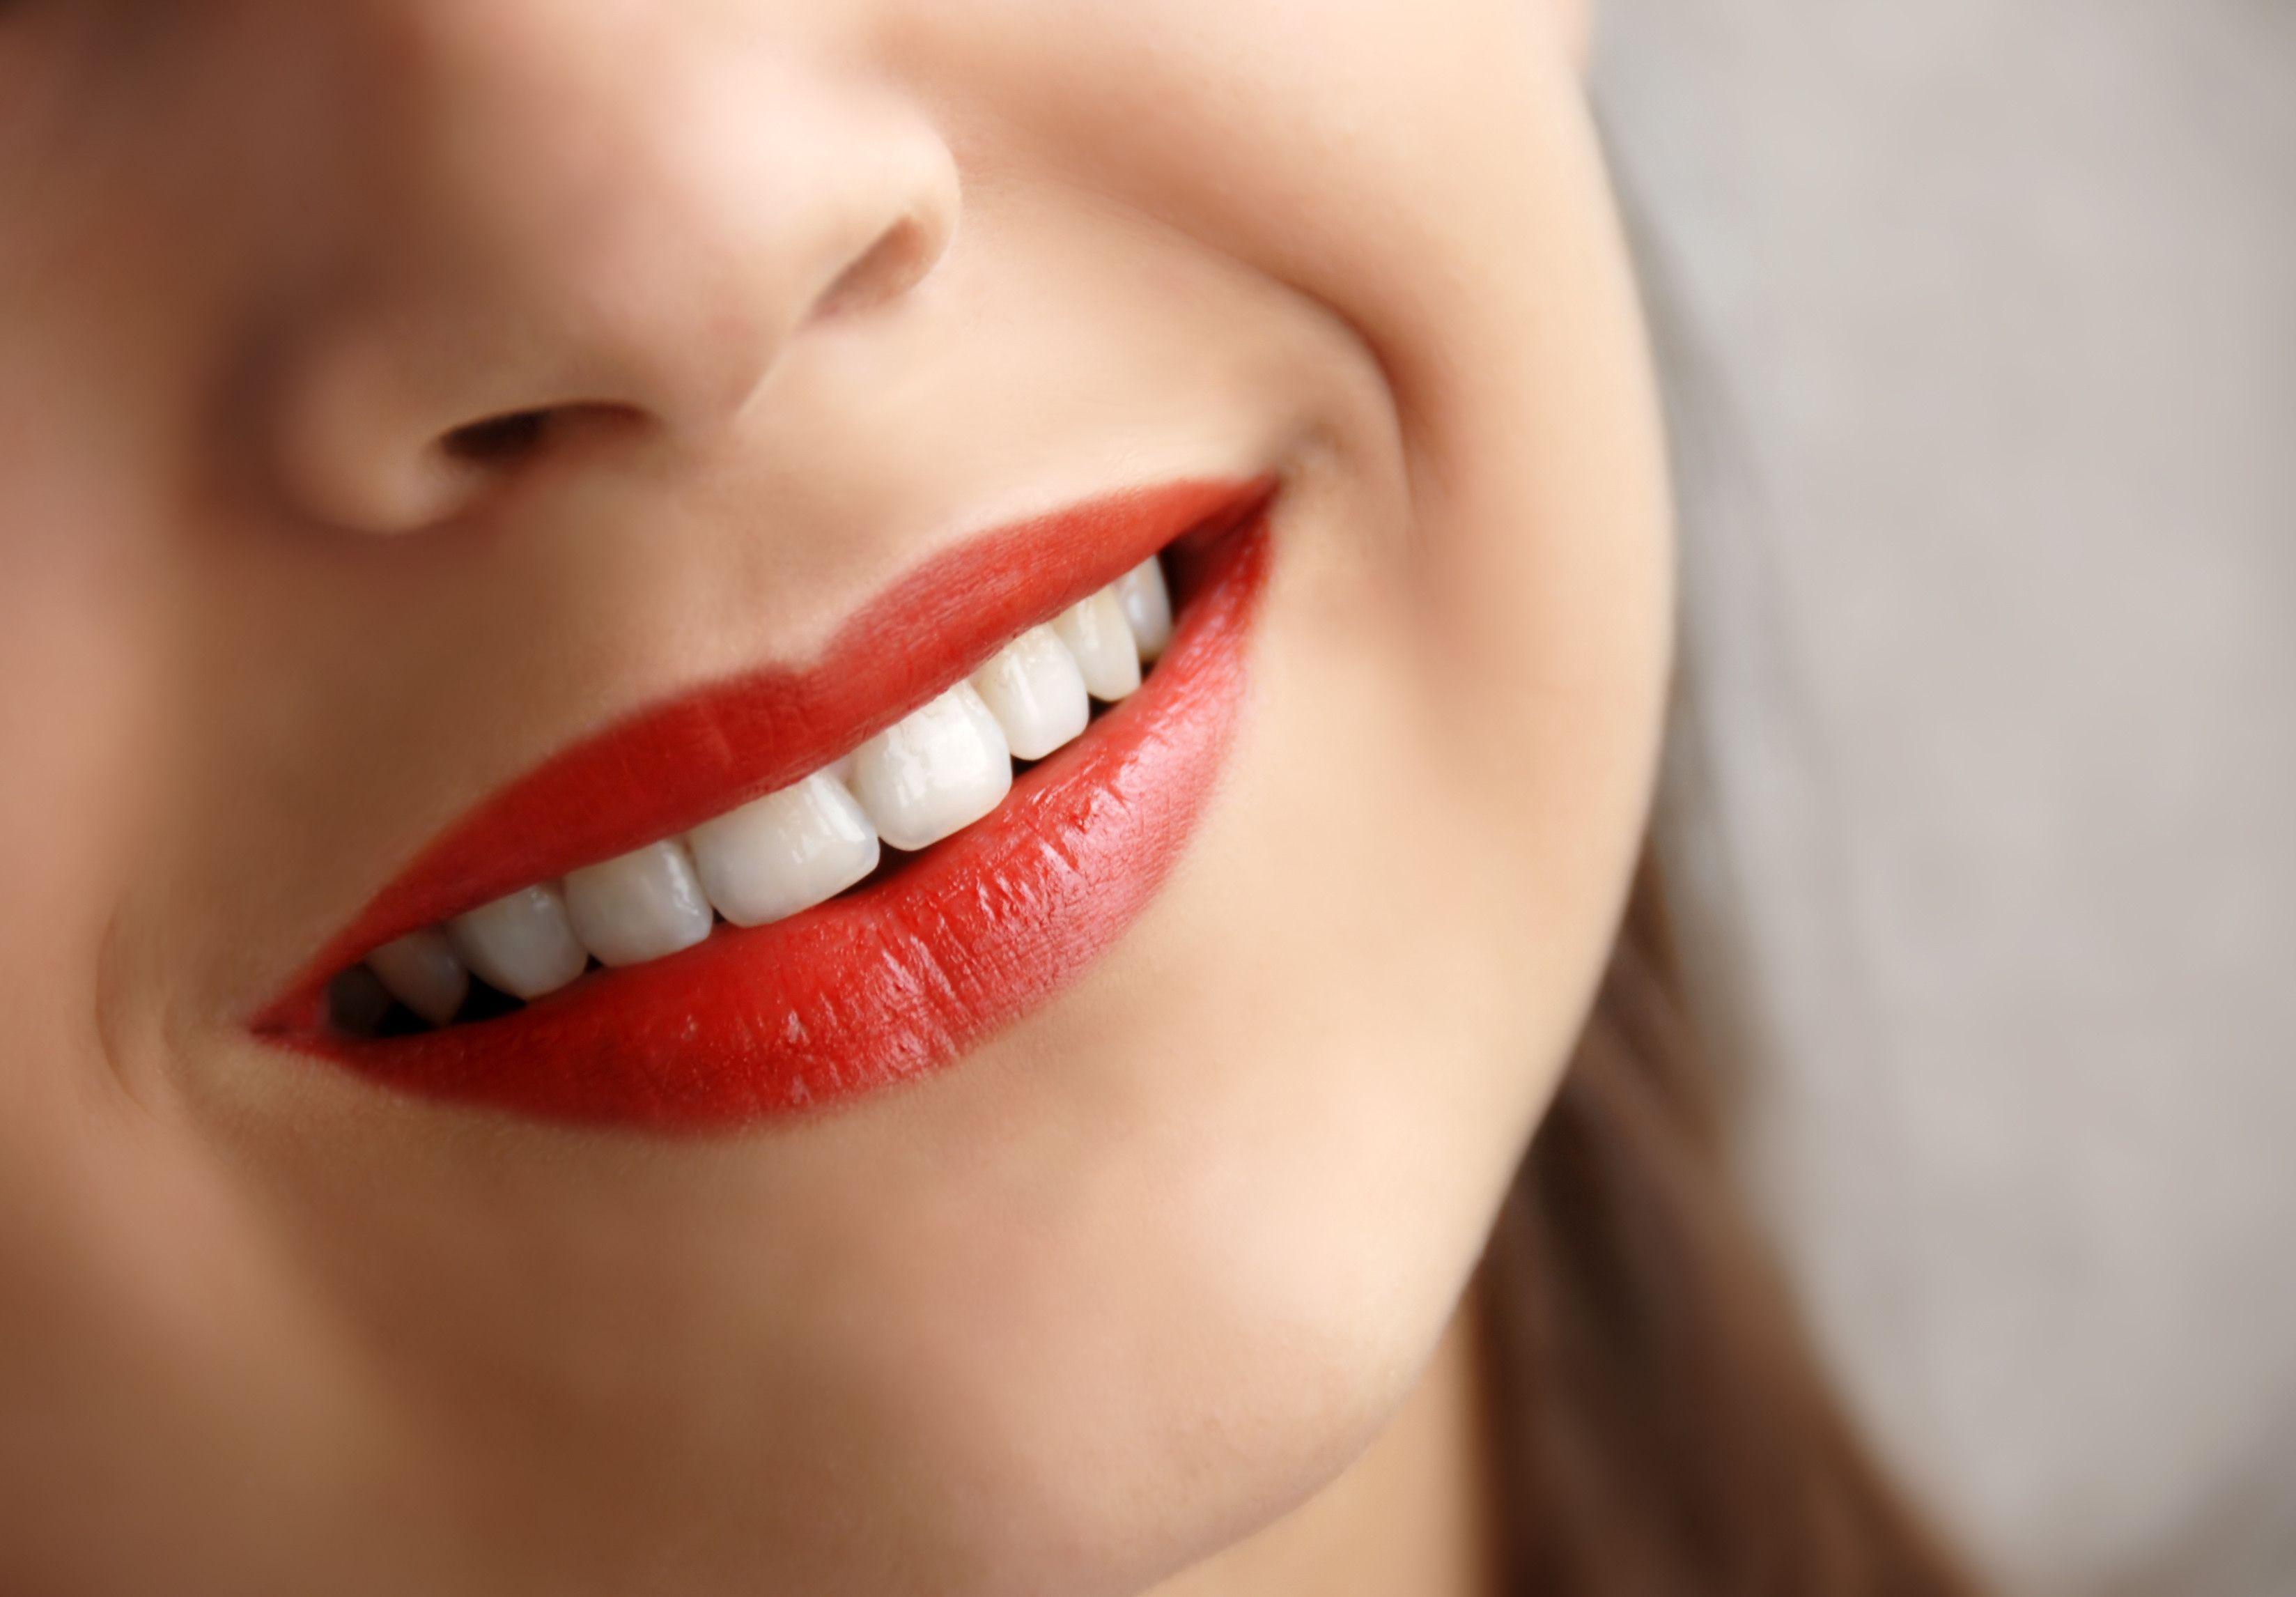 Cosmetic Dentist in Peoria